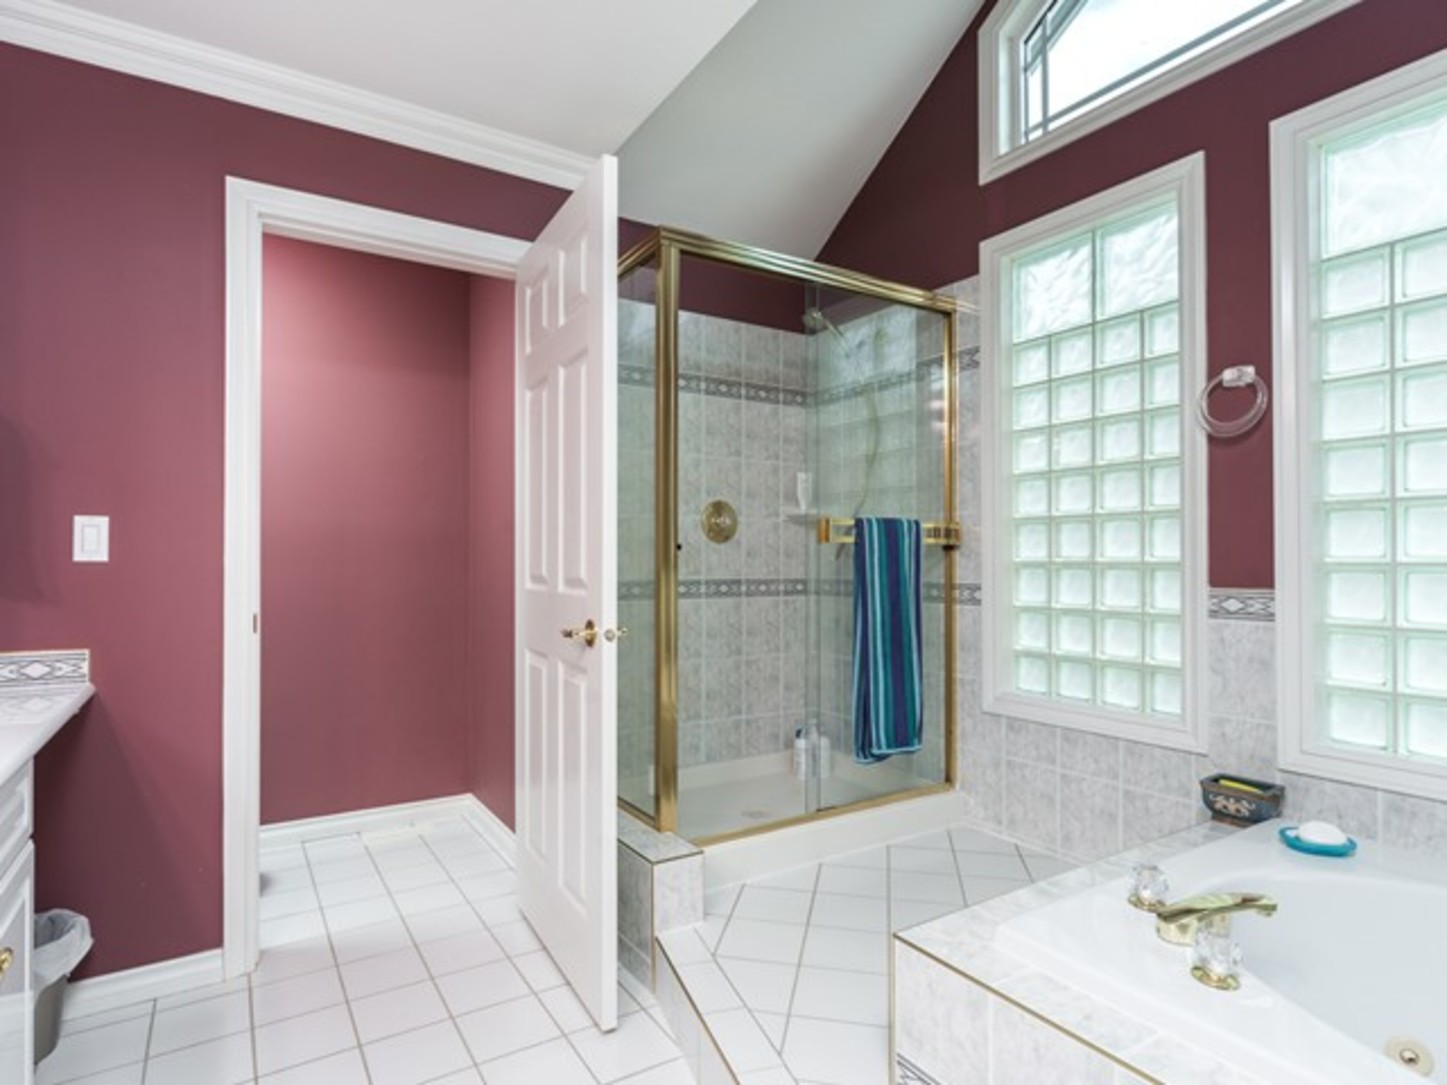 Bathroom at 15338 Sequoia Drive, Heritage Woods PM, Port Moody